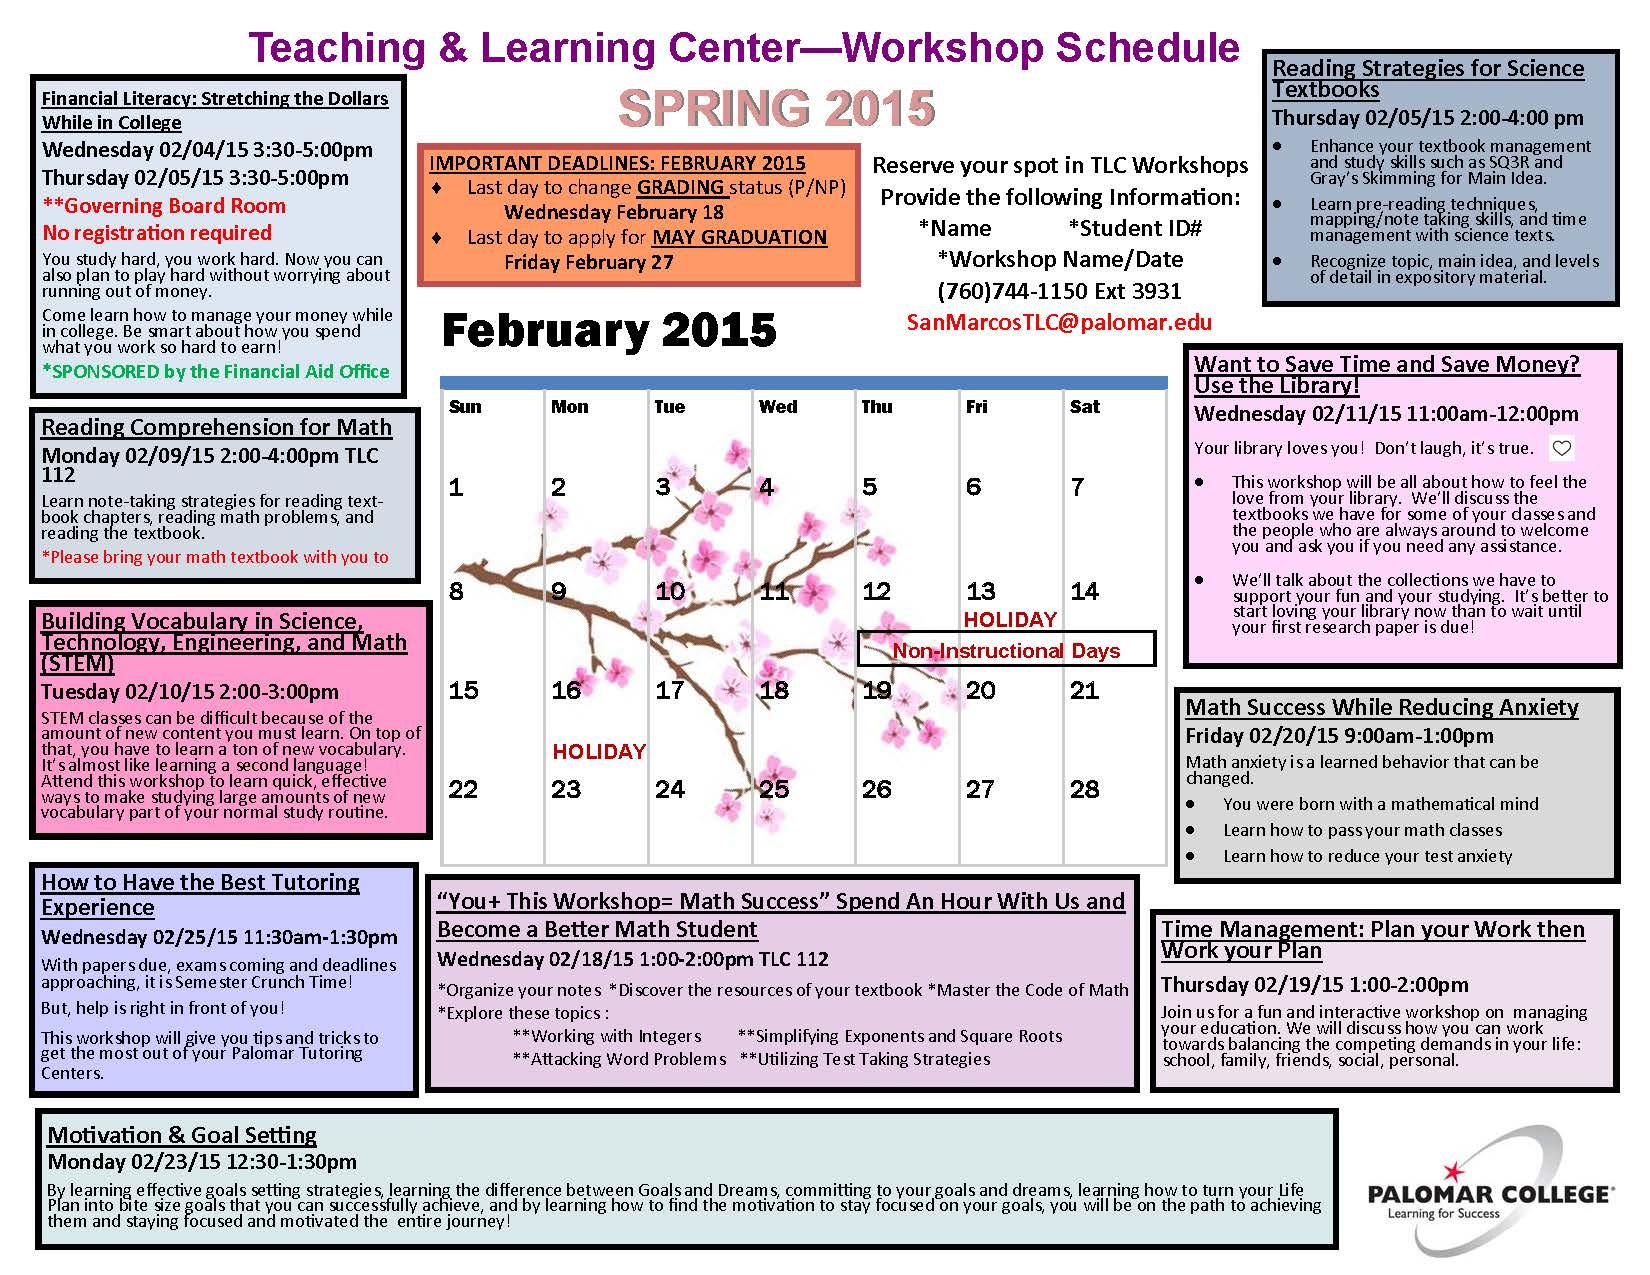 SP2015_TLC Workshop Schedule_FEB